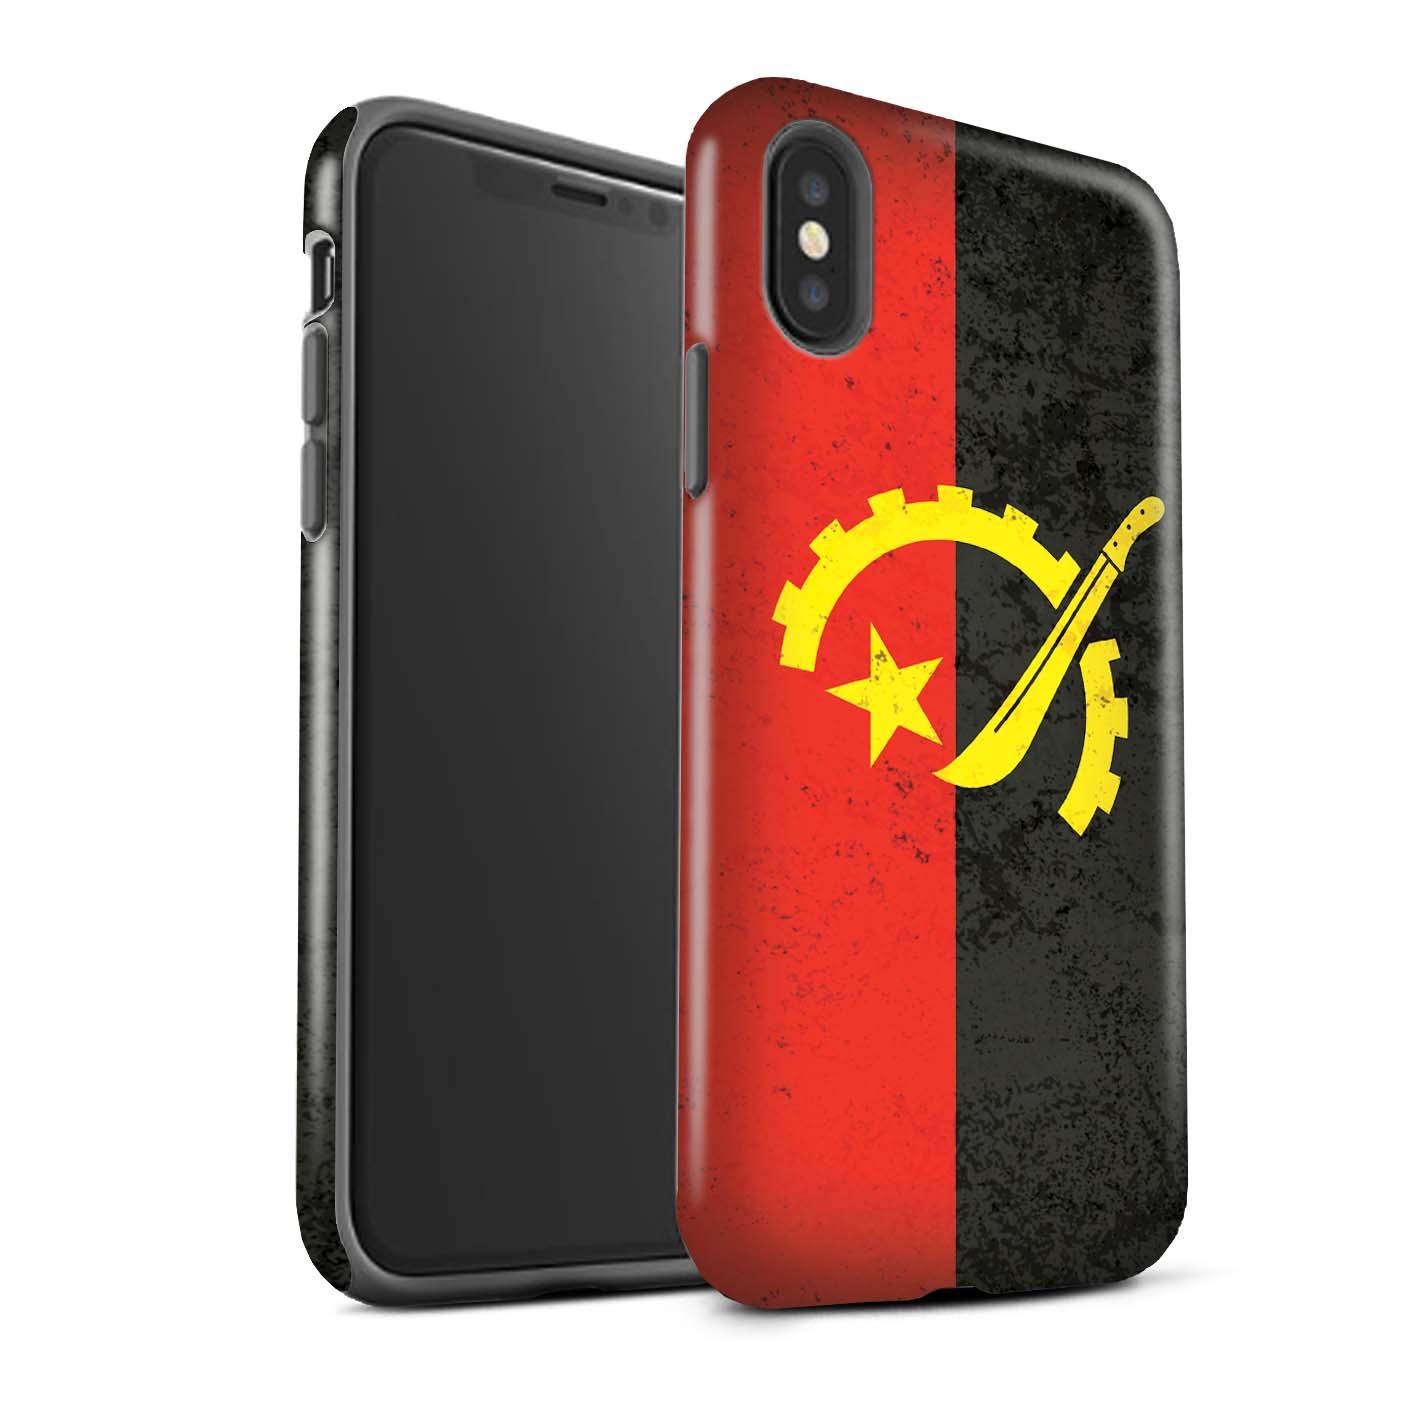 Personalised-Matte-Phone-Case-for-Apple-iPhone-XR-Custom-Handwritten-Name